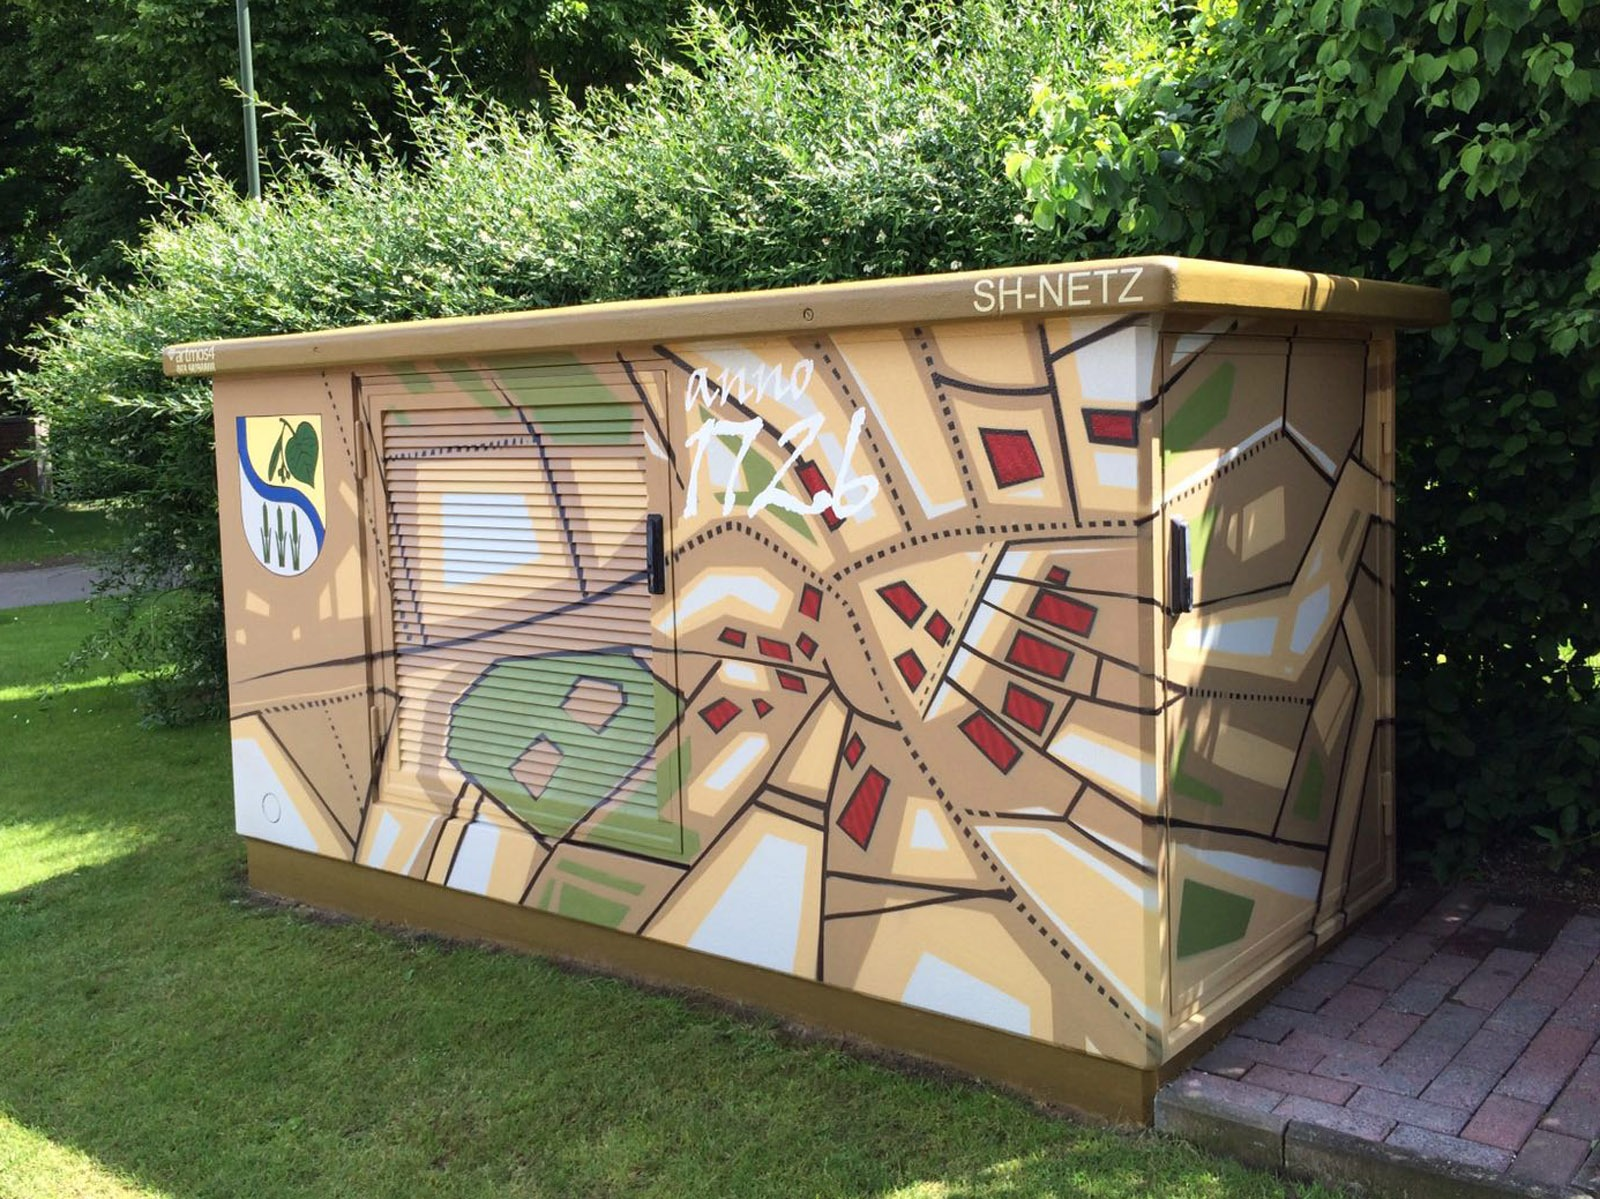 graffitiauftrag-graffitikuenstler-artmos4-hansewerk-2016-karte-wappen-schrift-beige-gruen-illustrativ-energieversorger